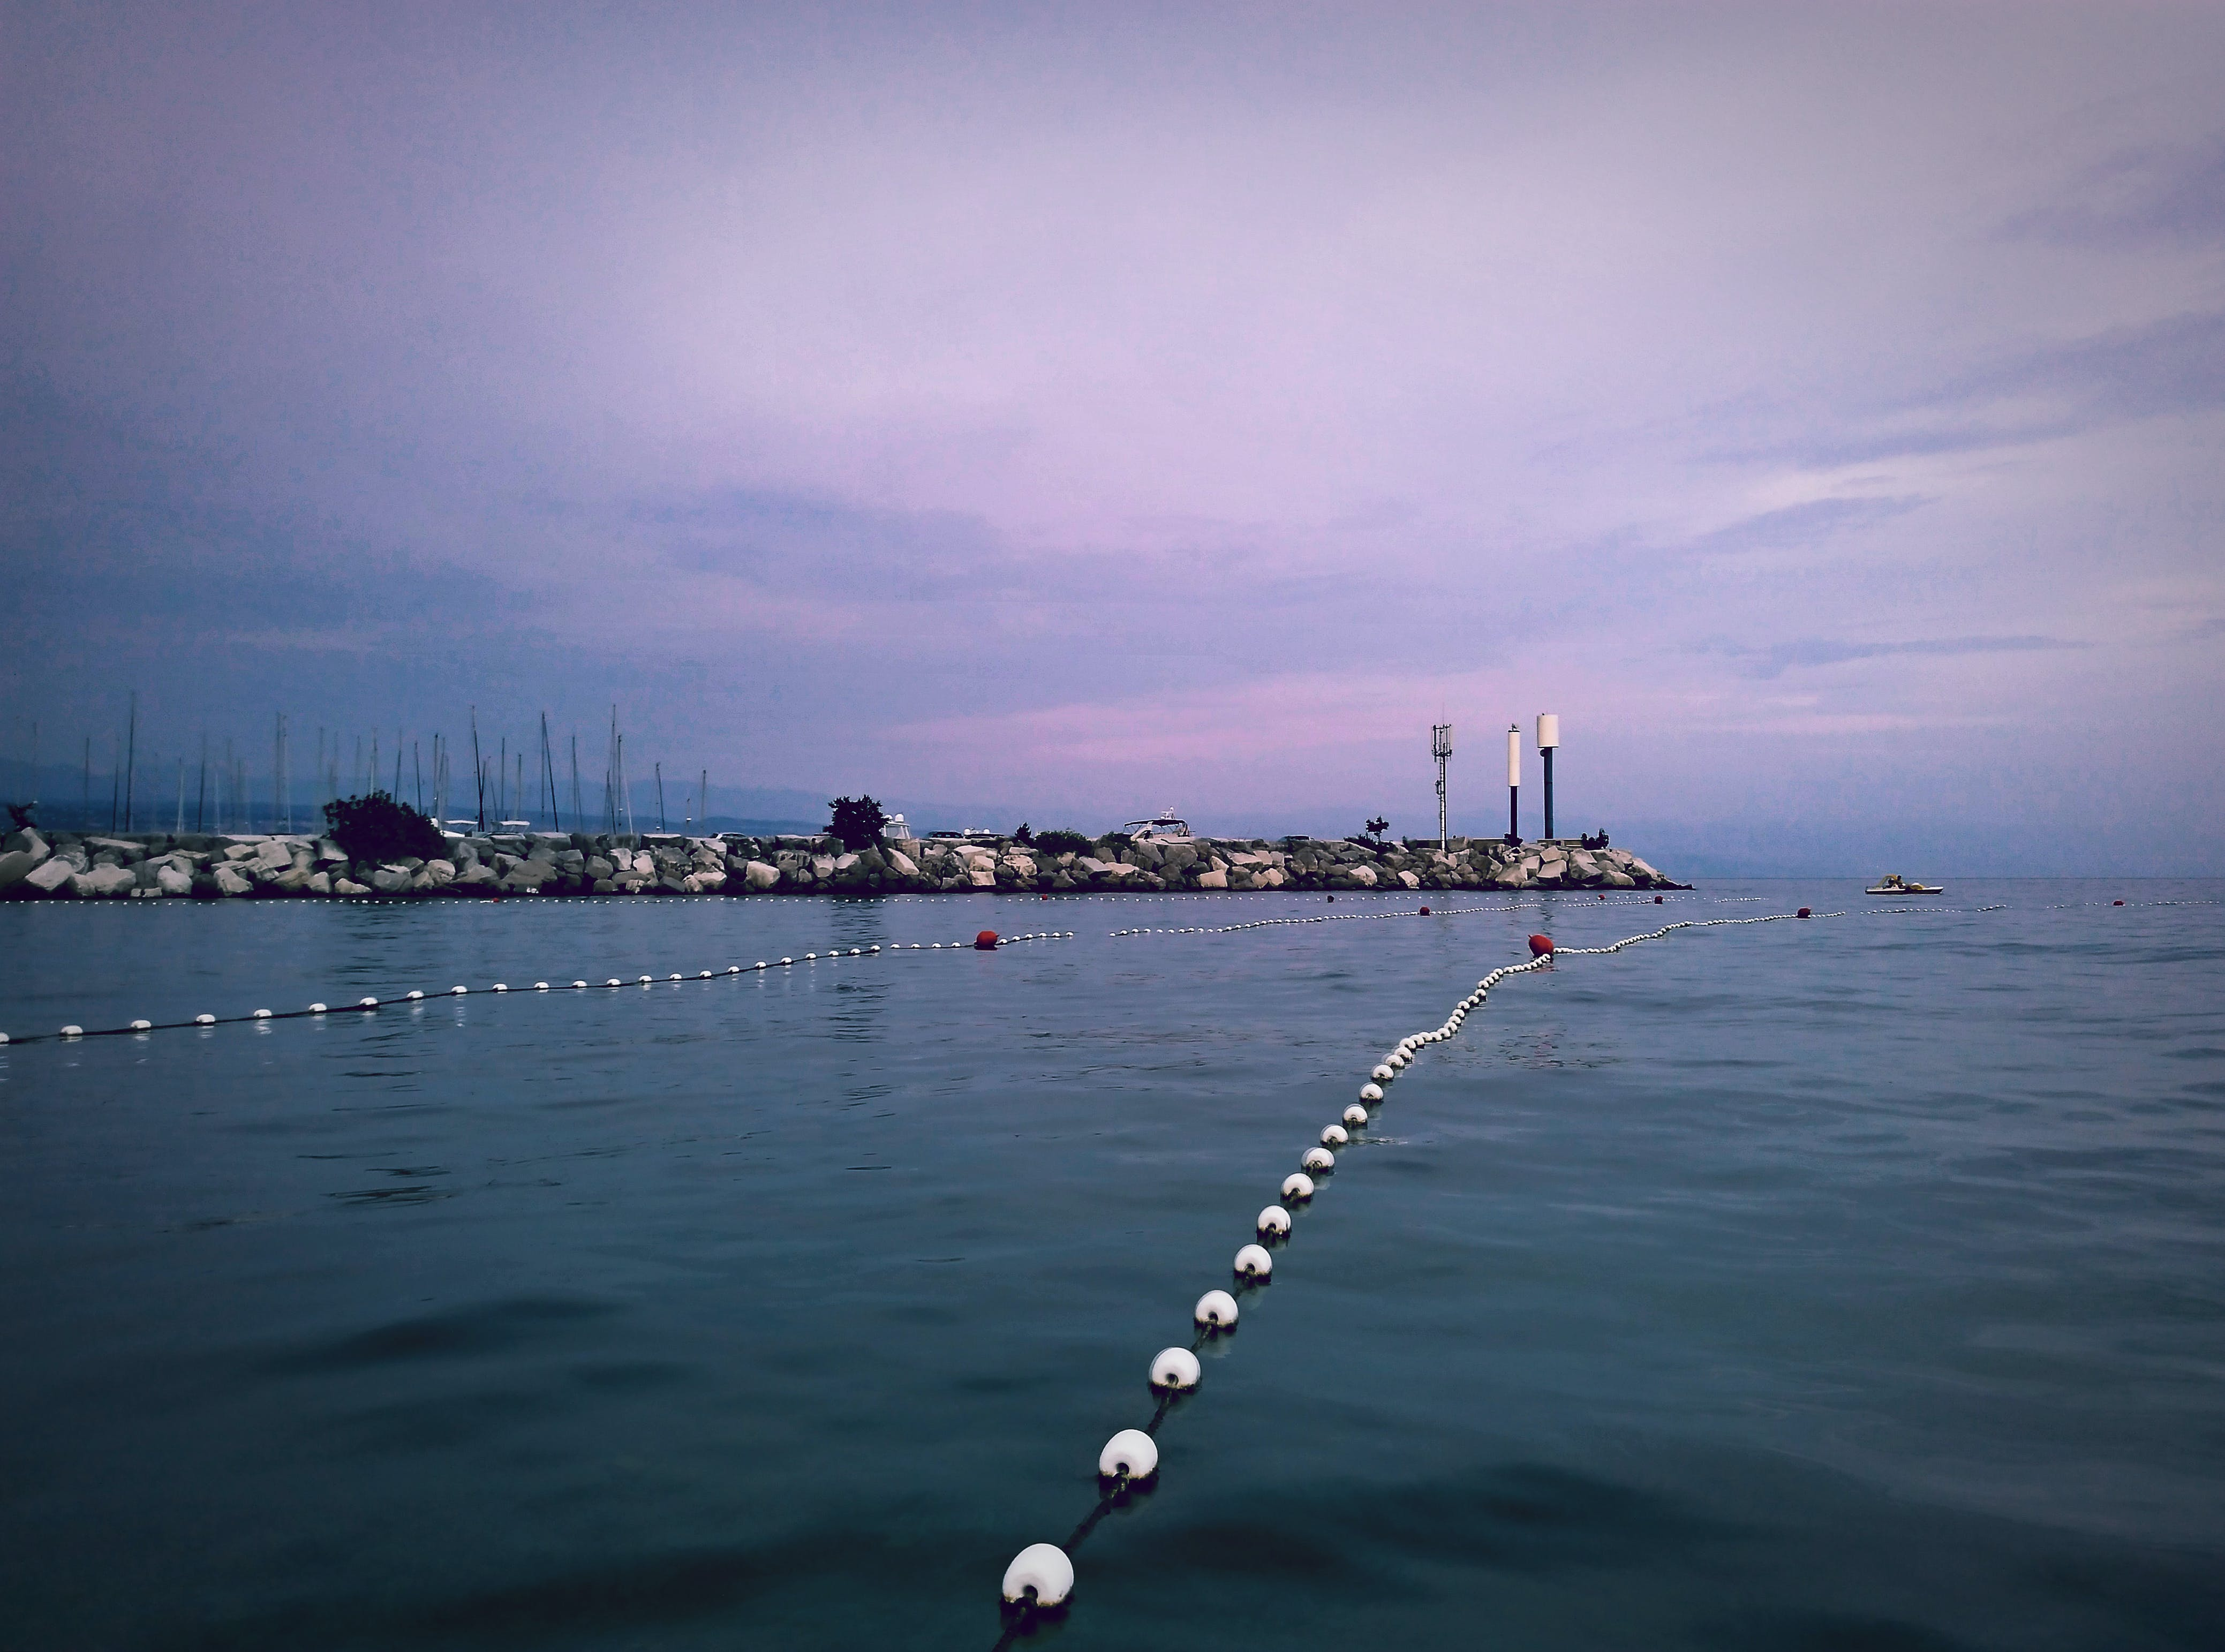 adriatic sea, blue water, calm waters